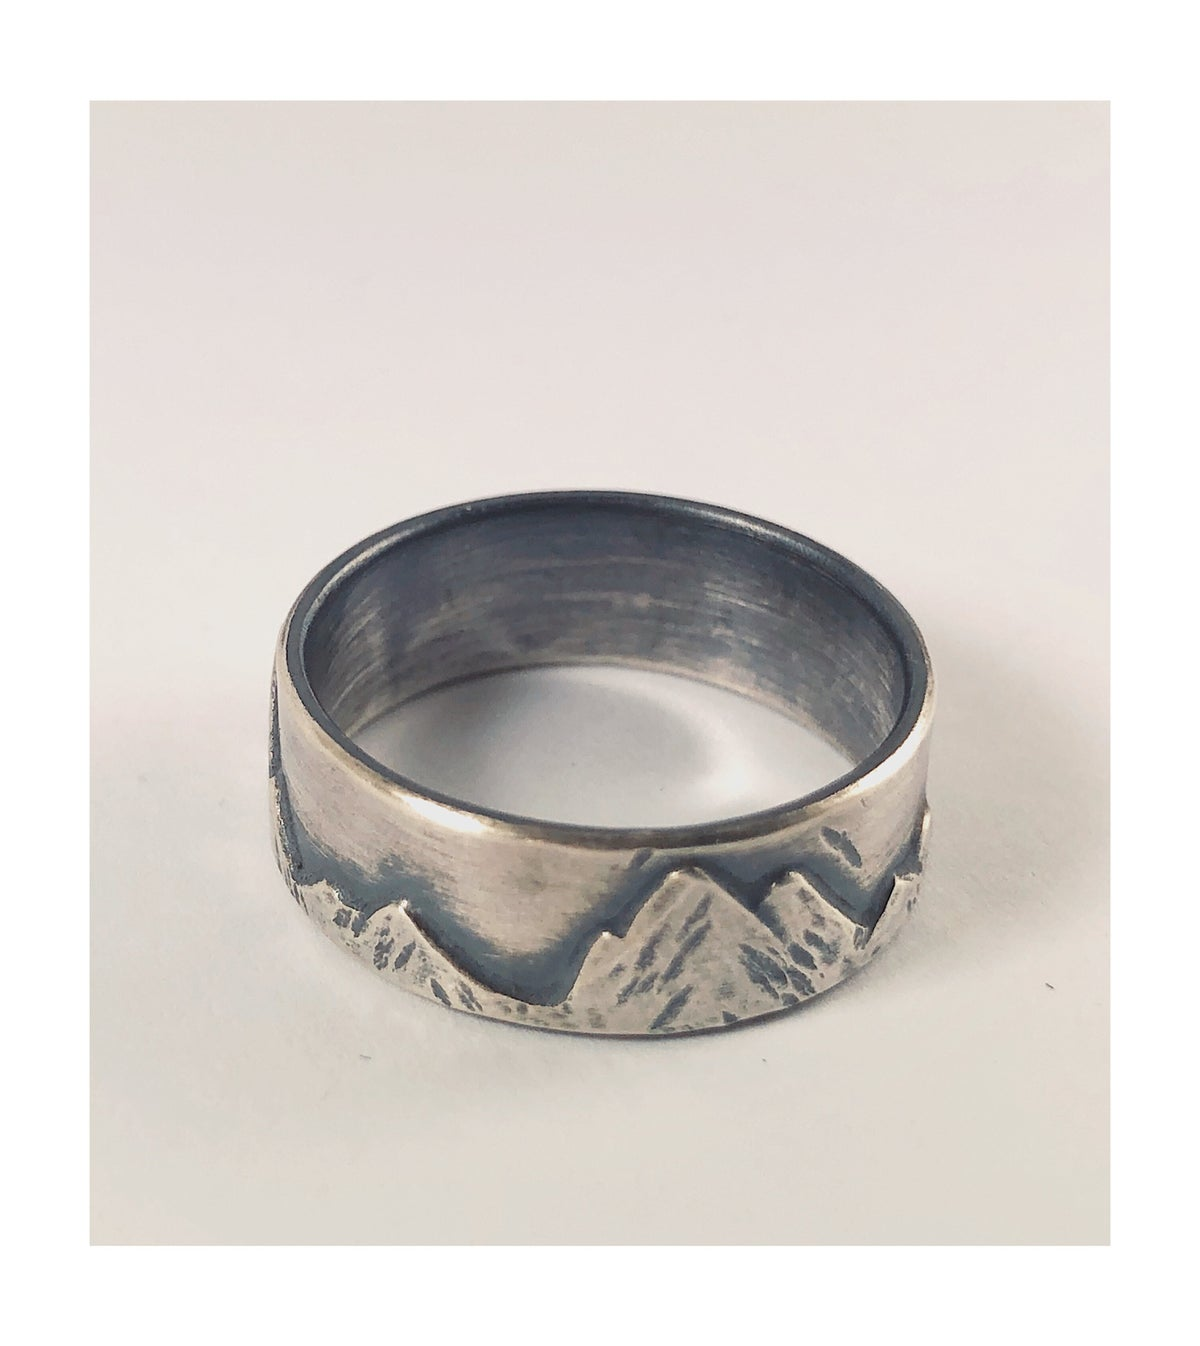 Image of Sterling Range Ring Size 7.75